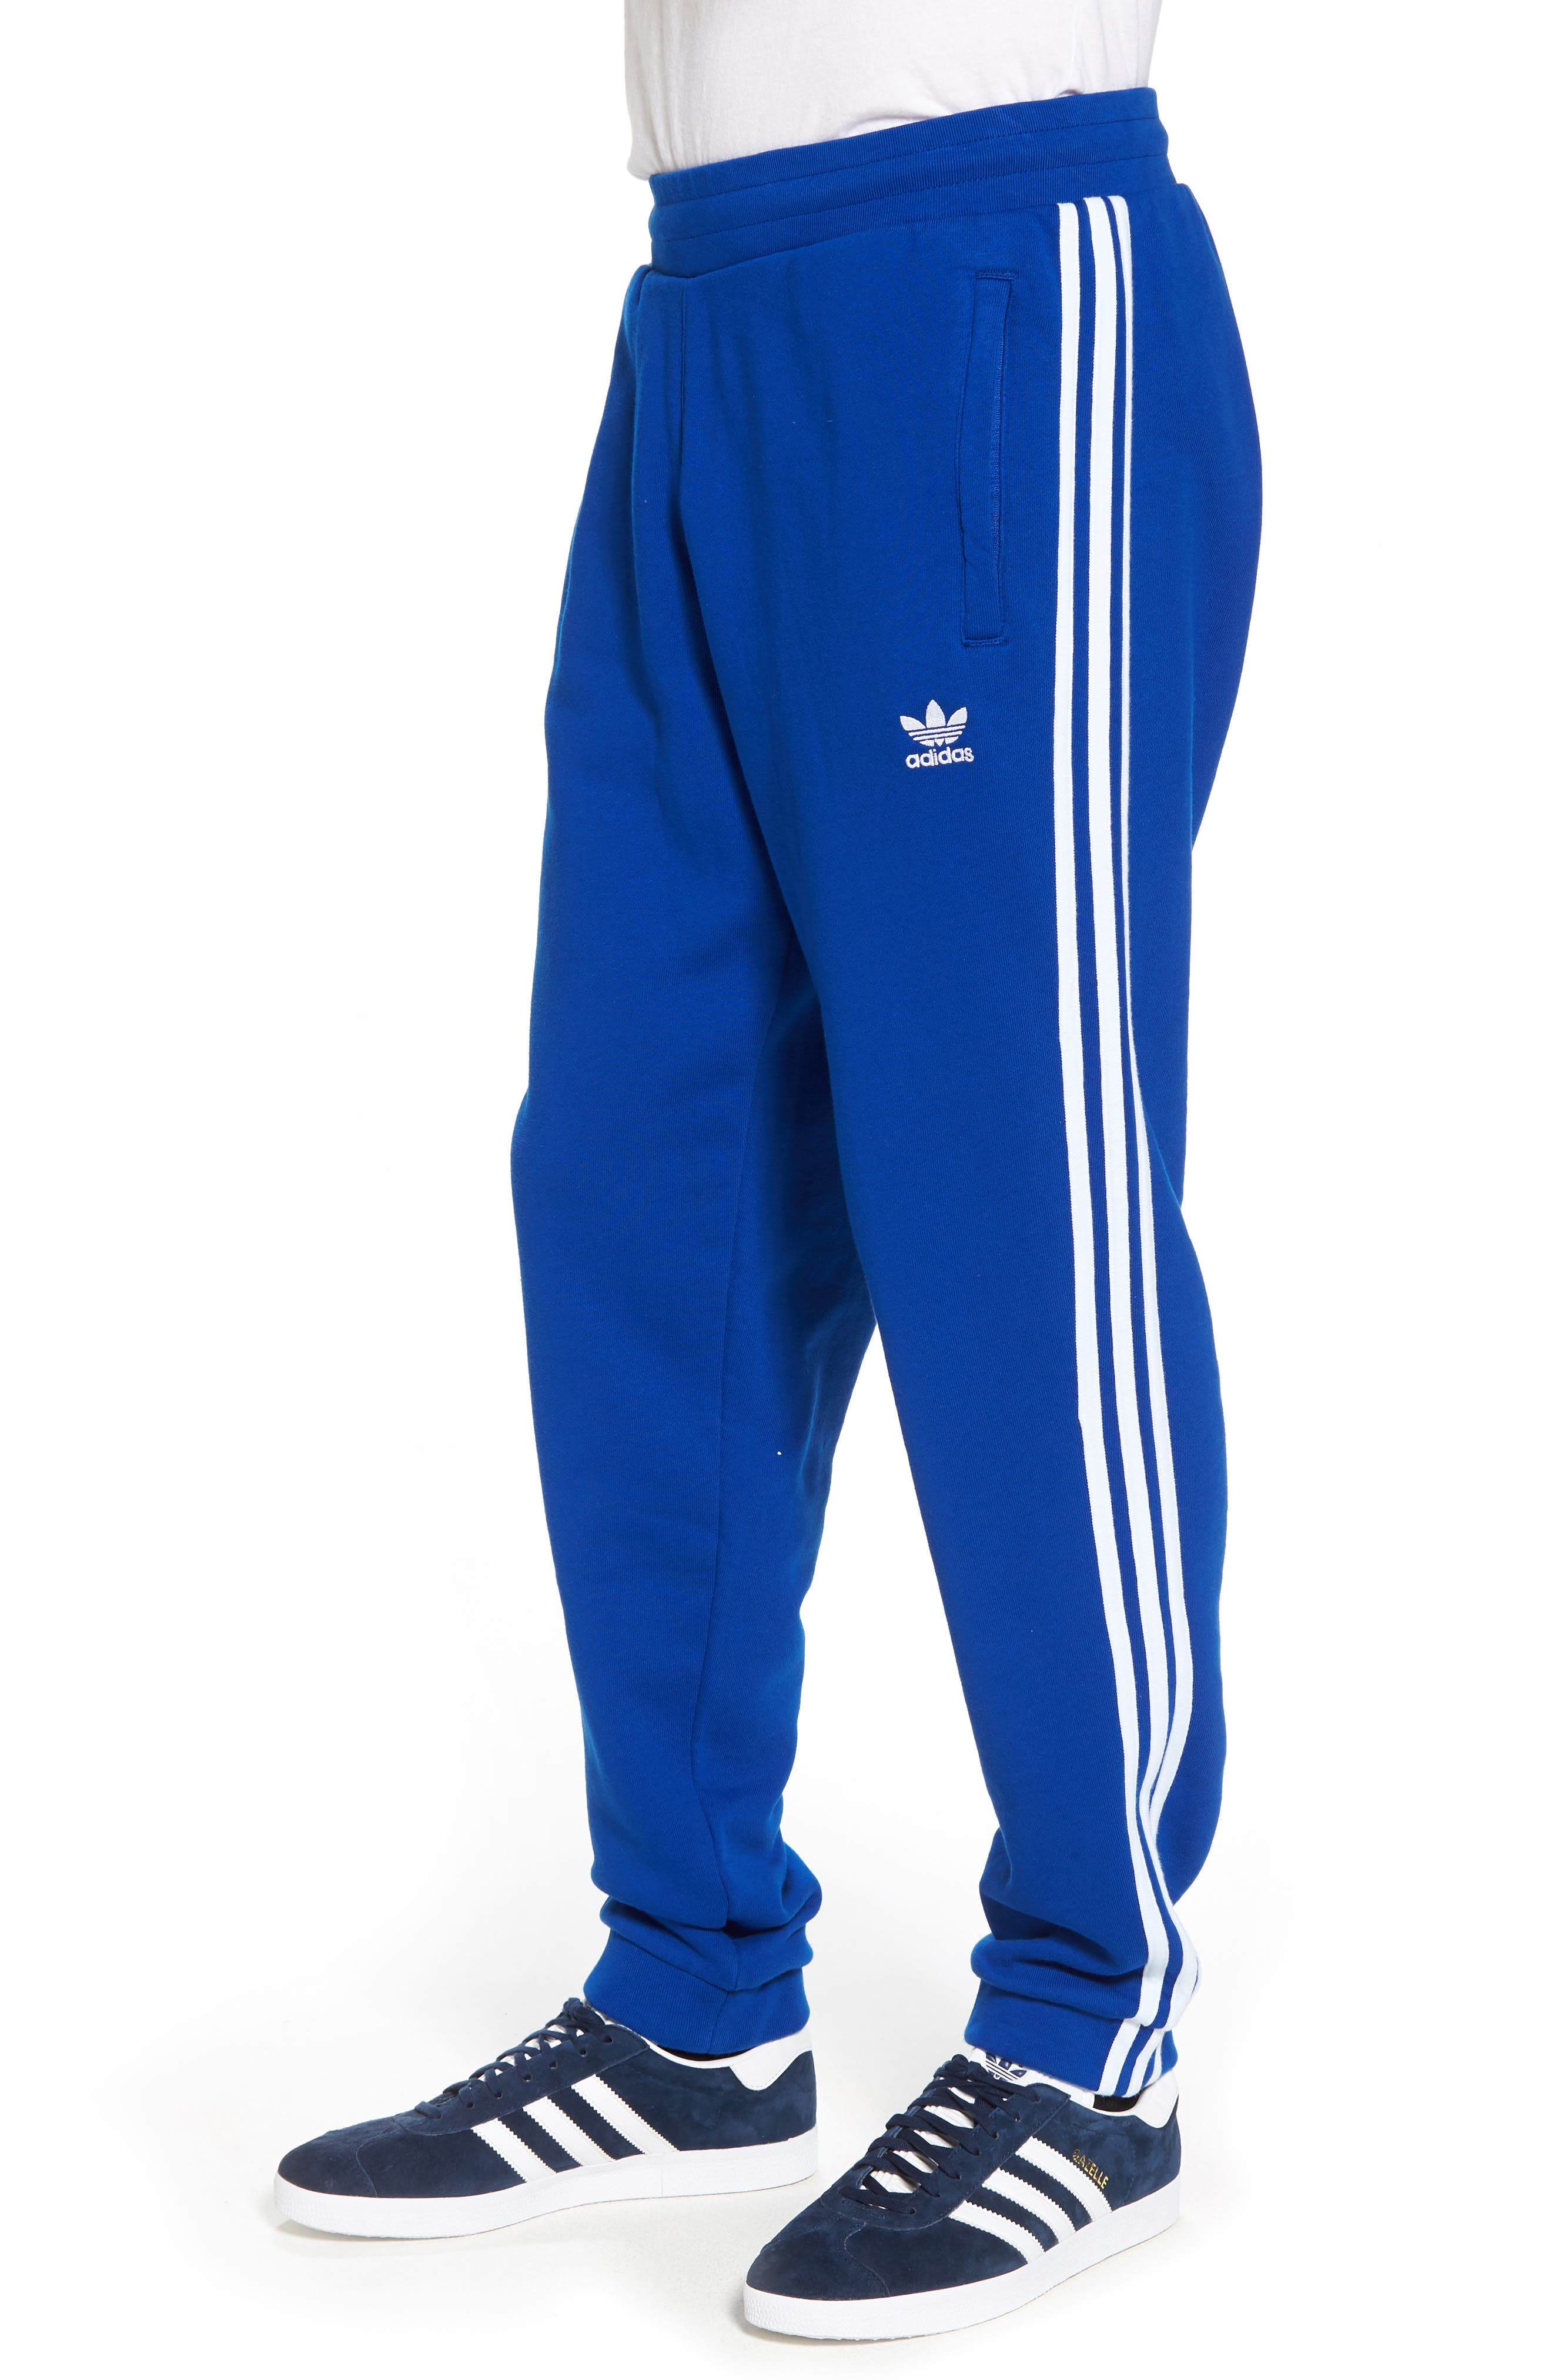 3-Stripes Sweatpants,                             Alternate thumbnail 3, color,                             Collegiate Royal